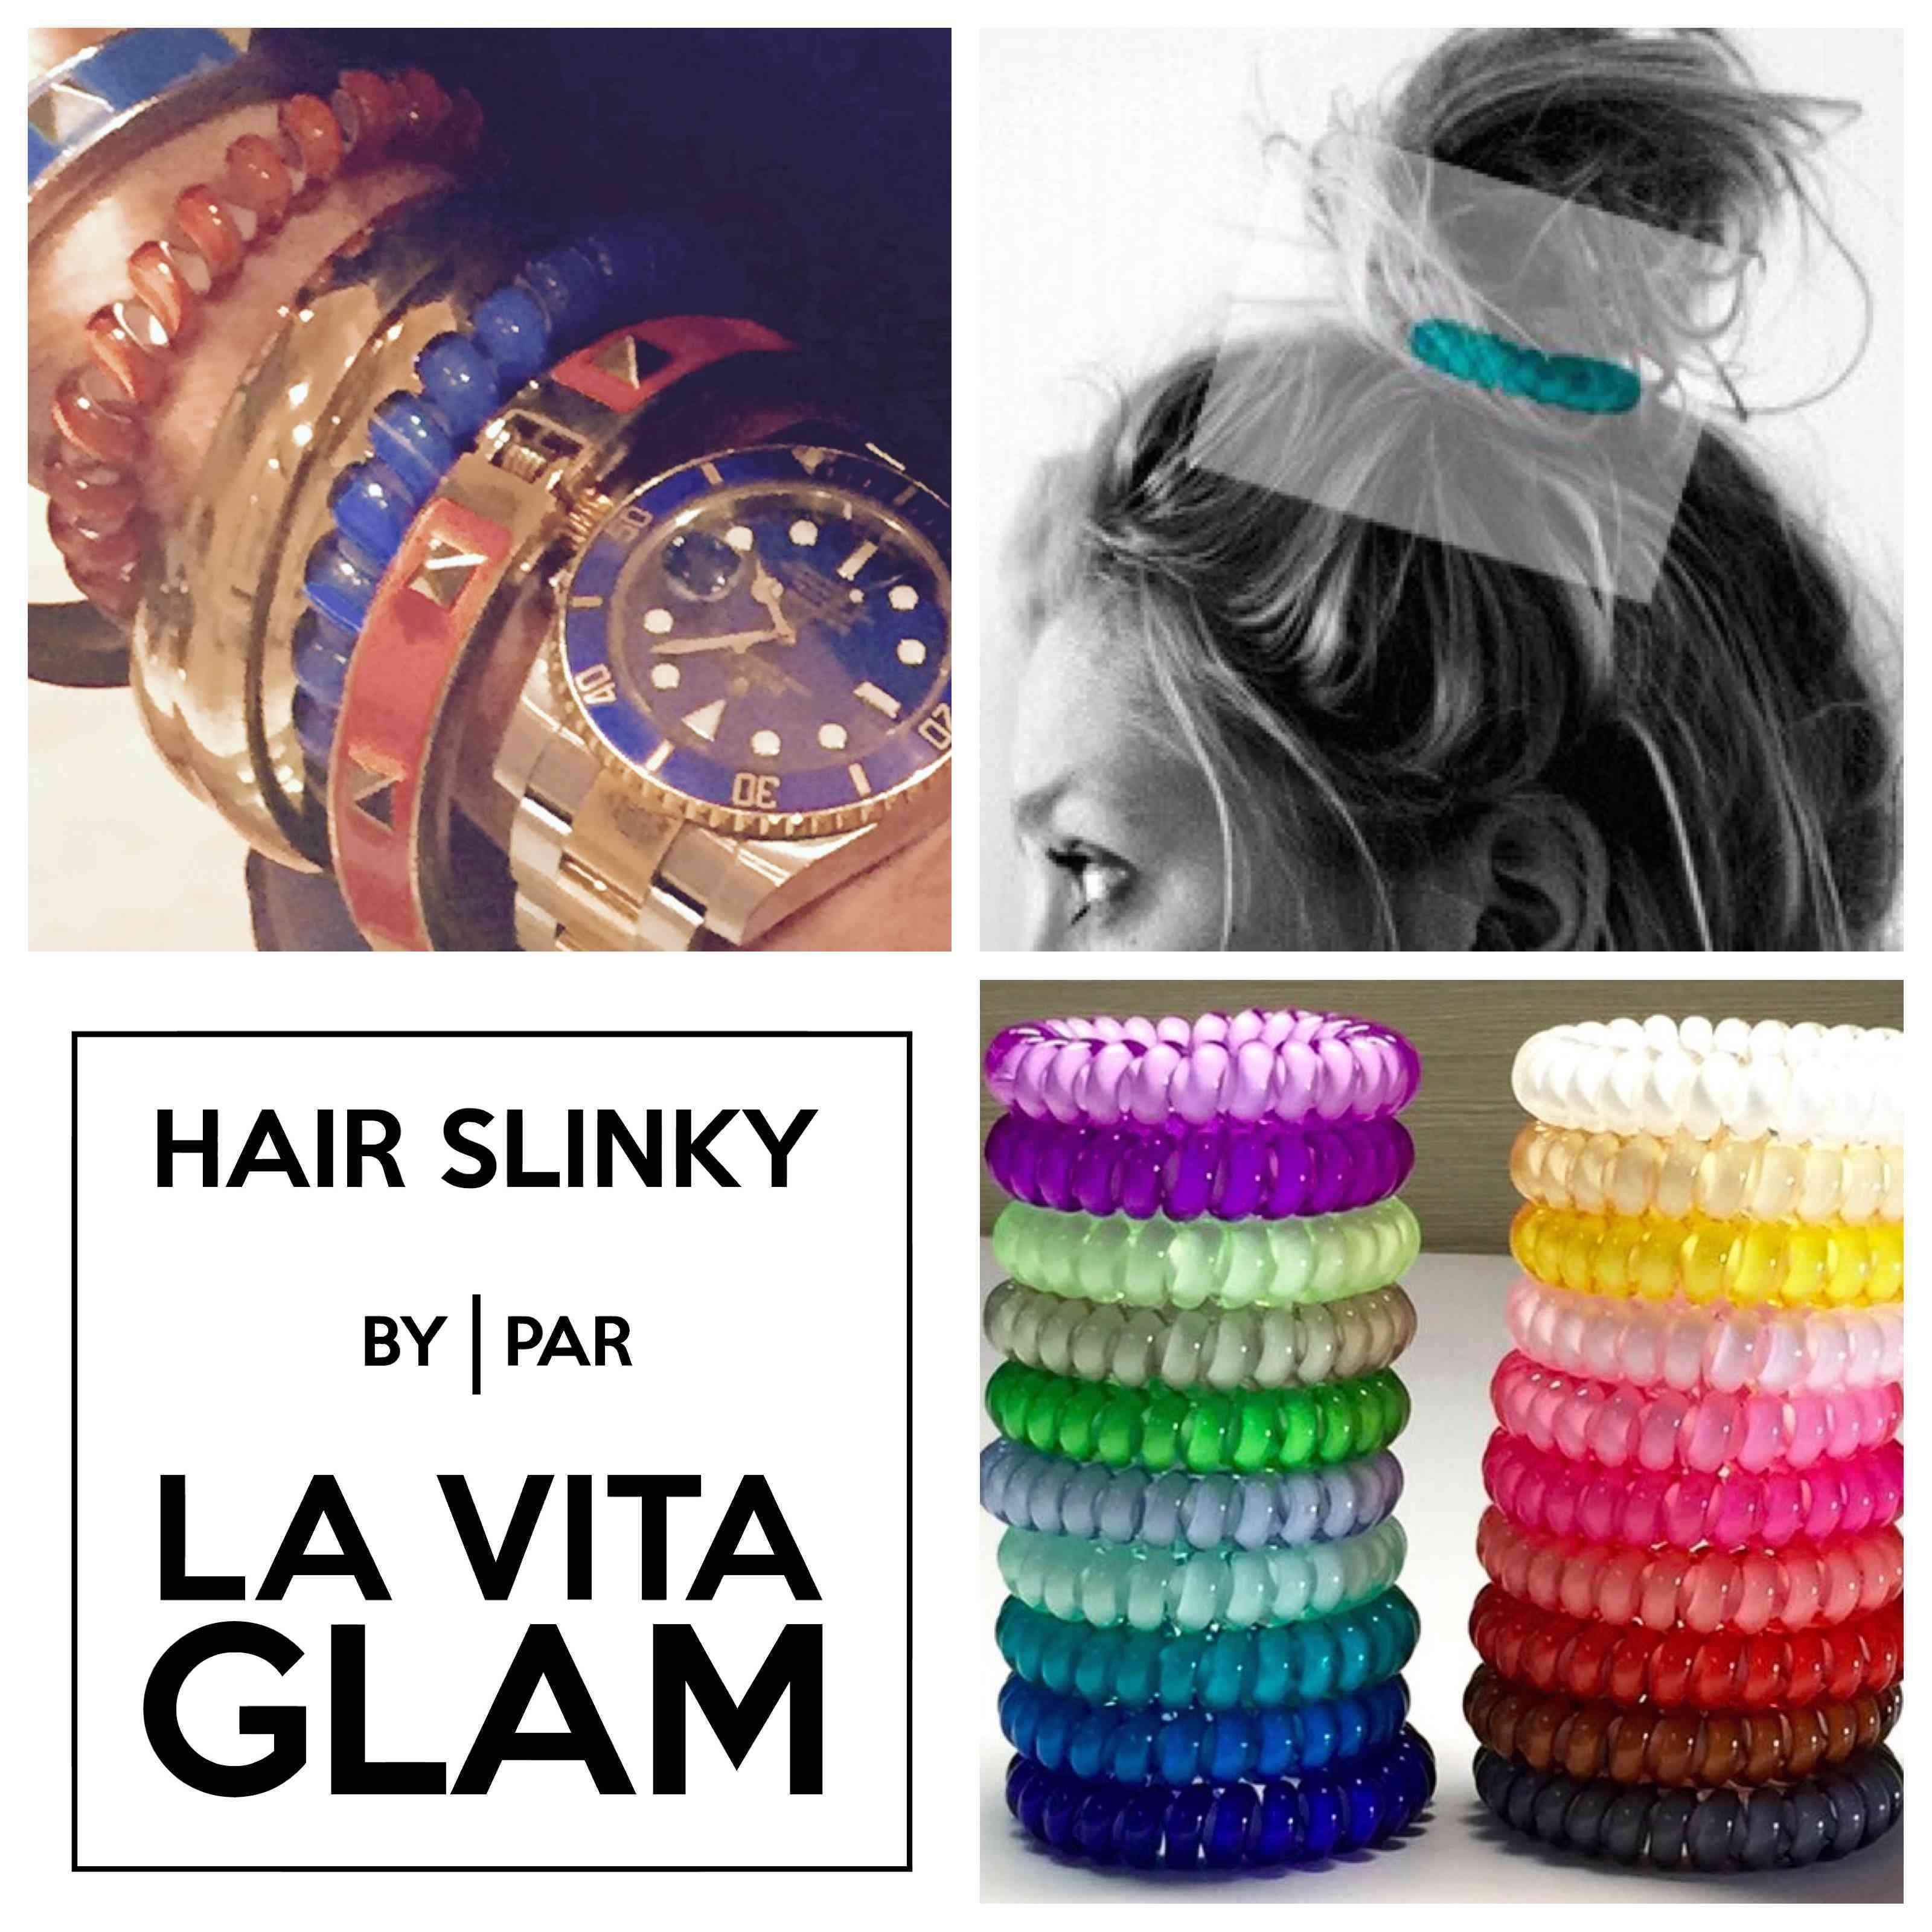 hairslinky